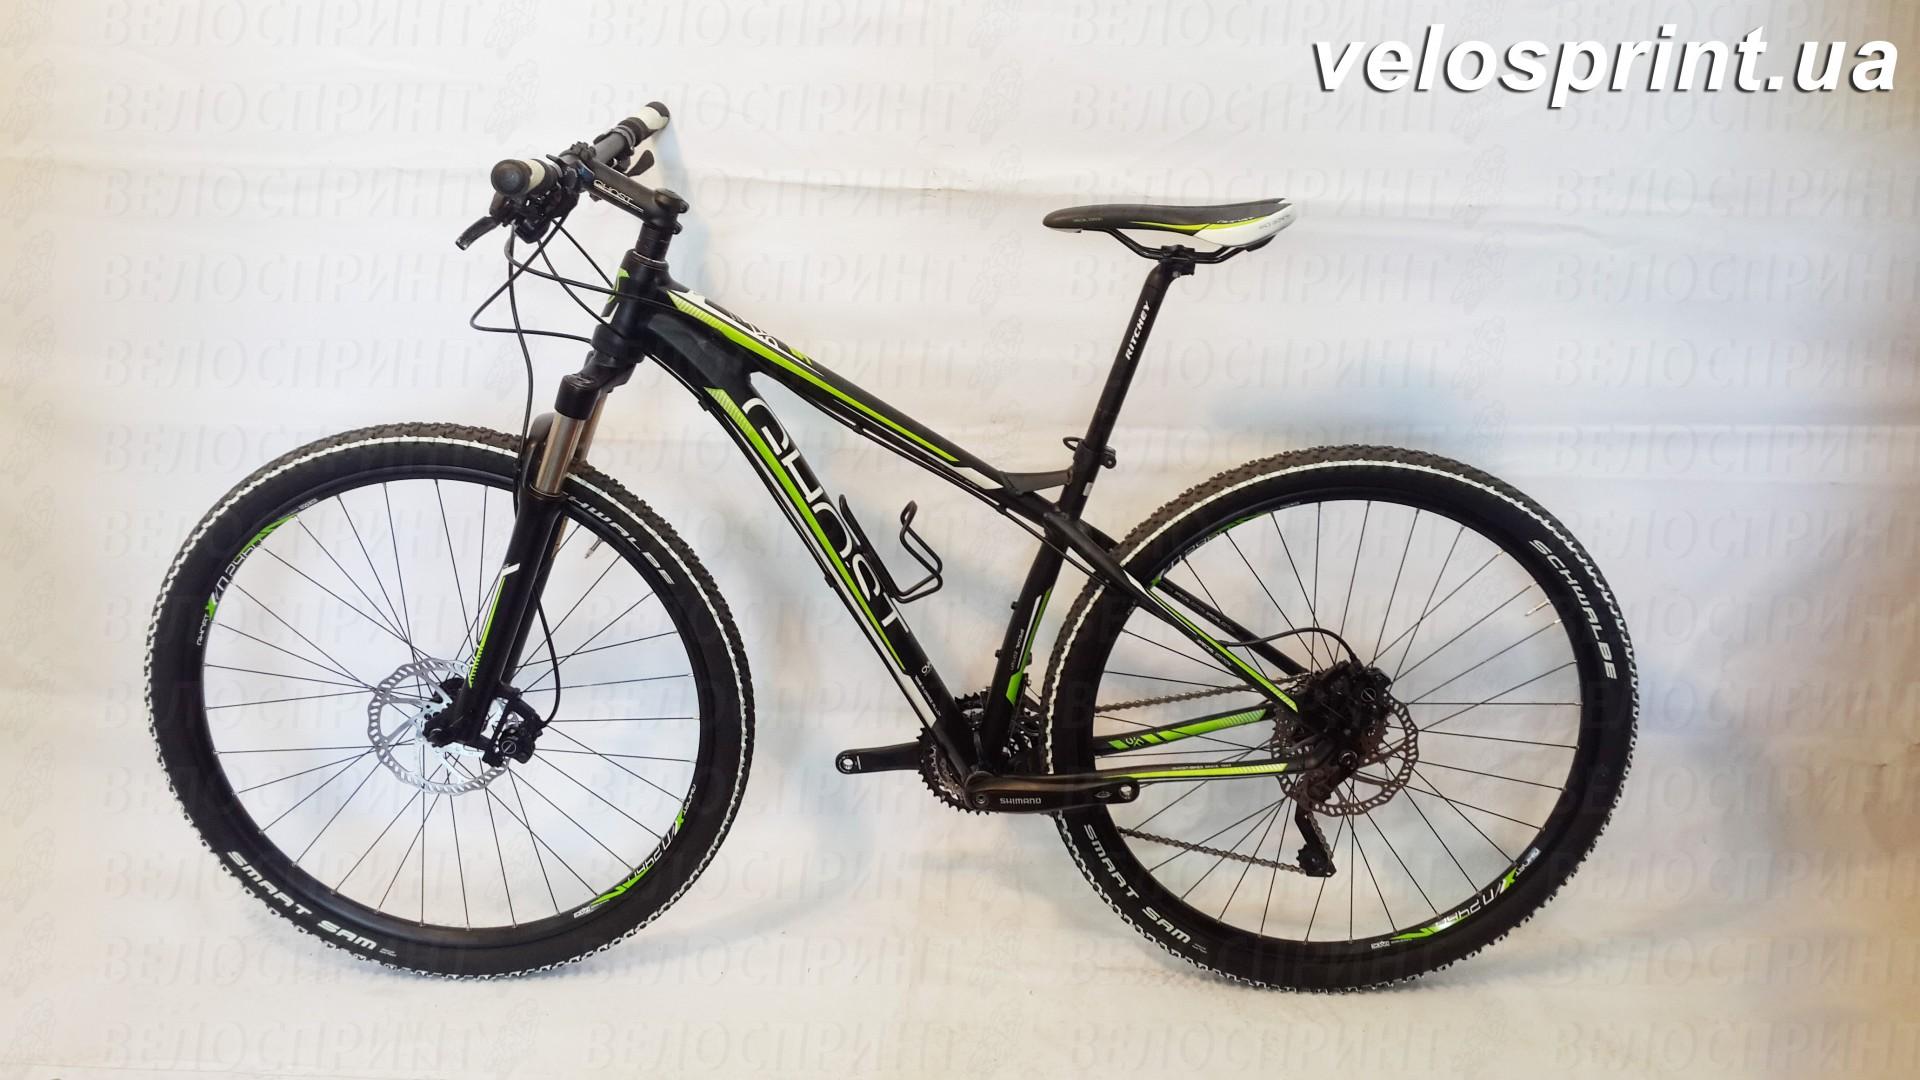 Велосипед GHOST SE 2950 black/white/green общий вид год 2013